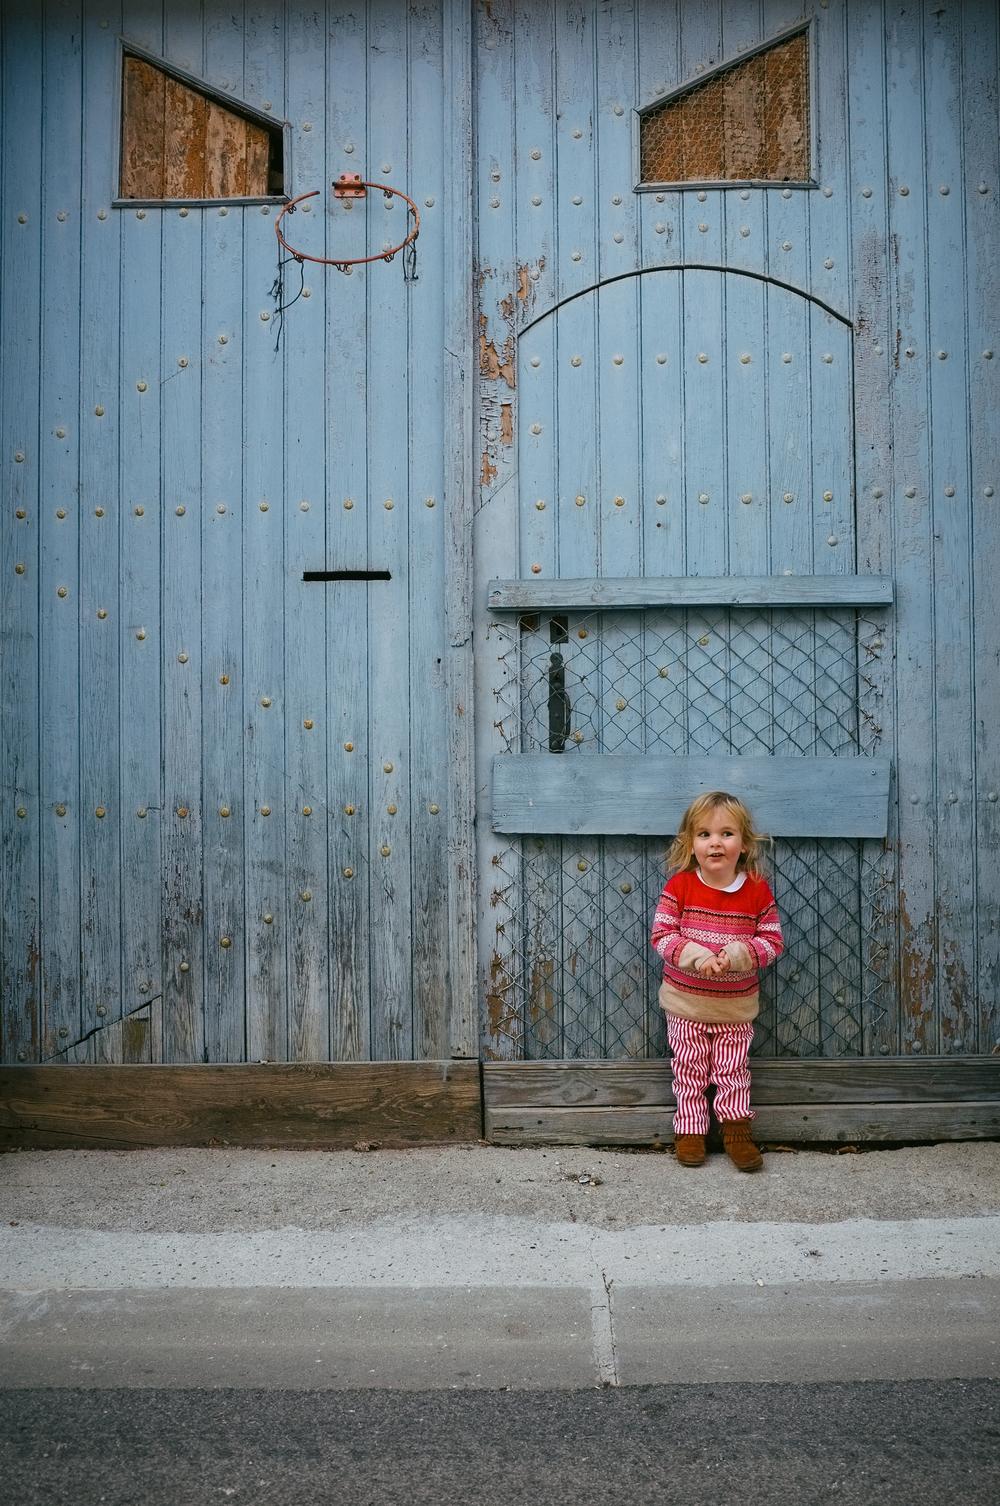 Hoop dreams, yo. Villeneuve-Minervois